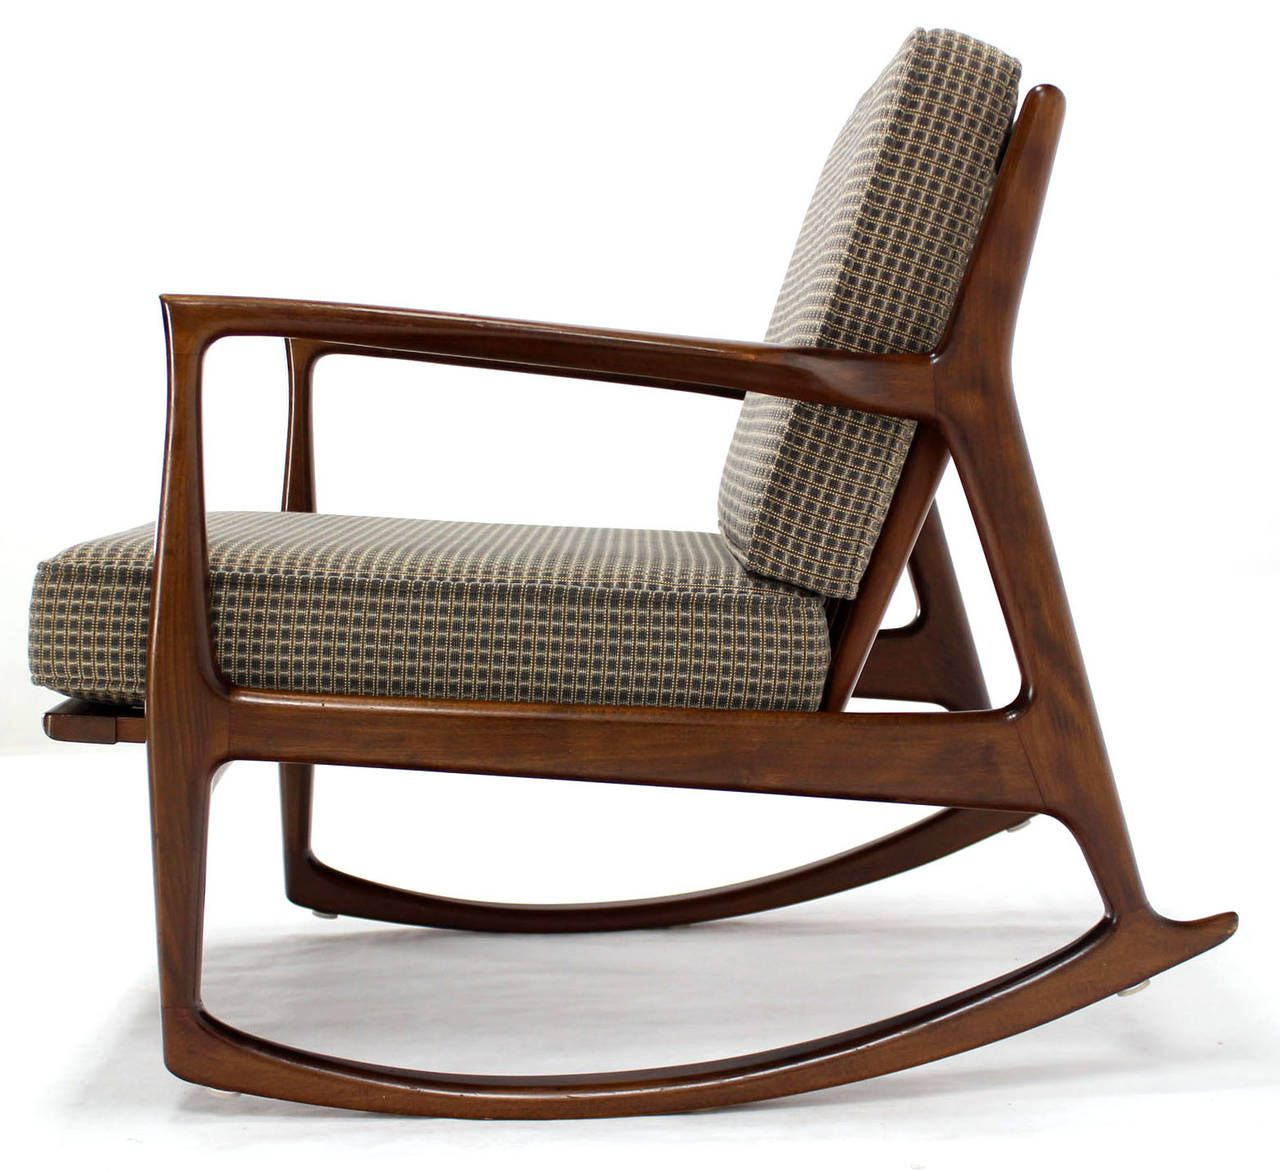 Long mid century modern rocking chair